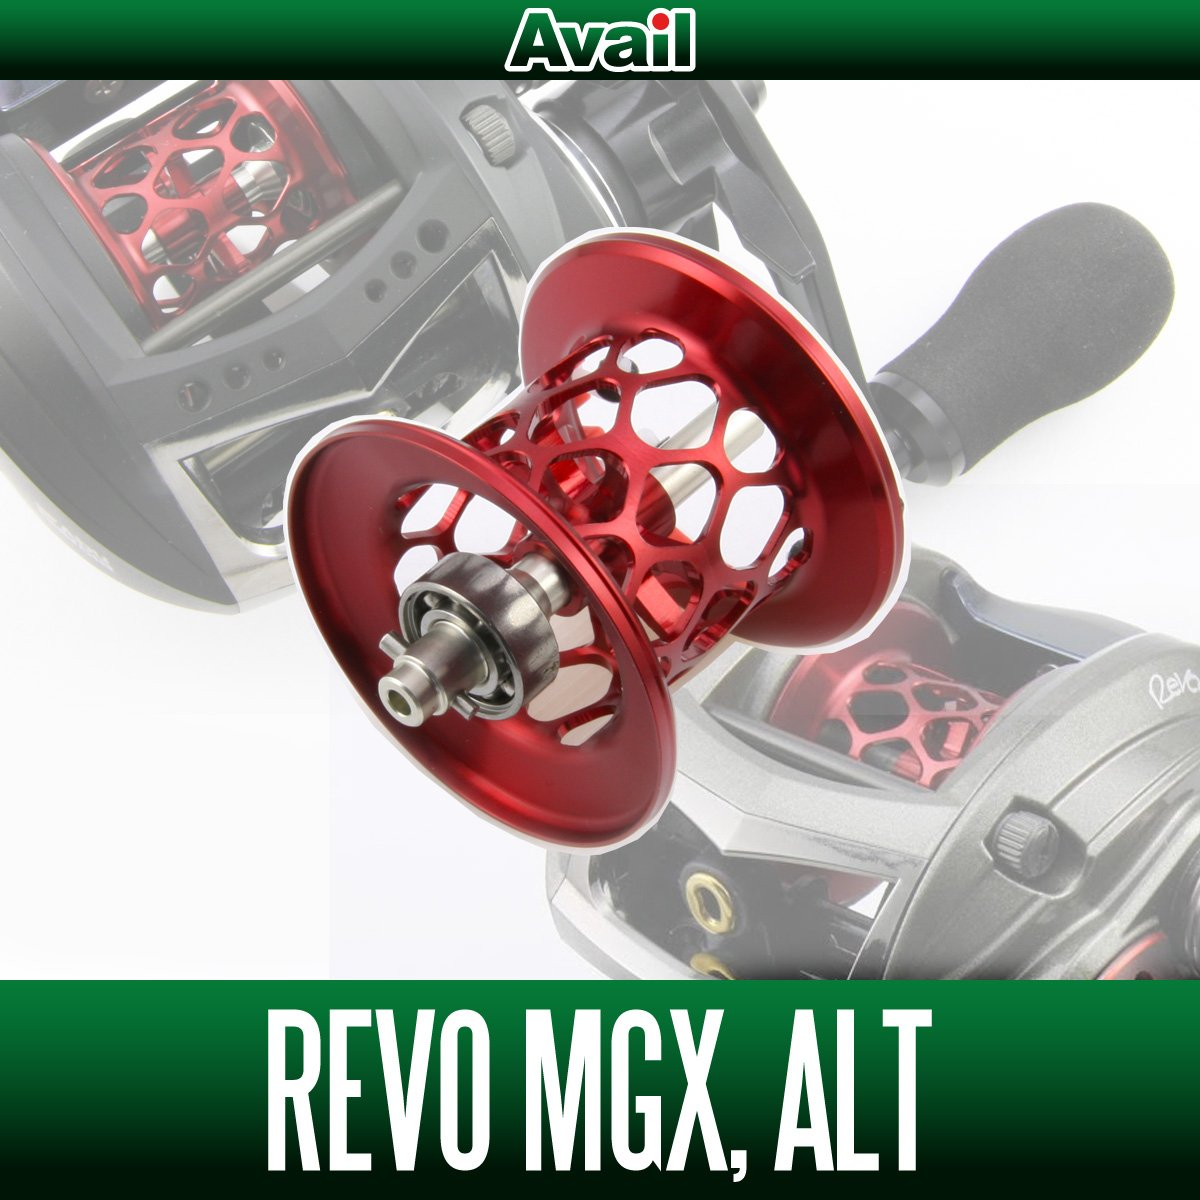 【Avail/アベイル】 Abu Revo MGXALT用 NEWマイクロキャストスプール MGX57RR レッド   B00YAH5DEC